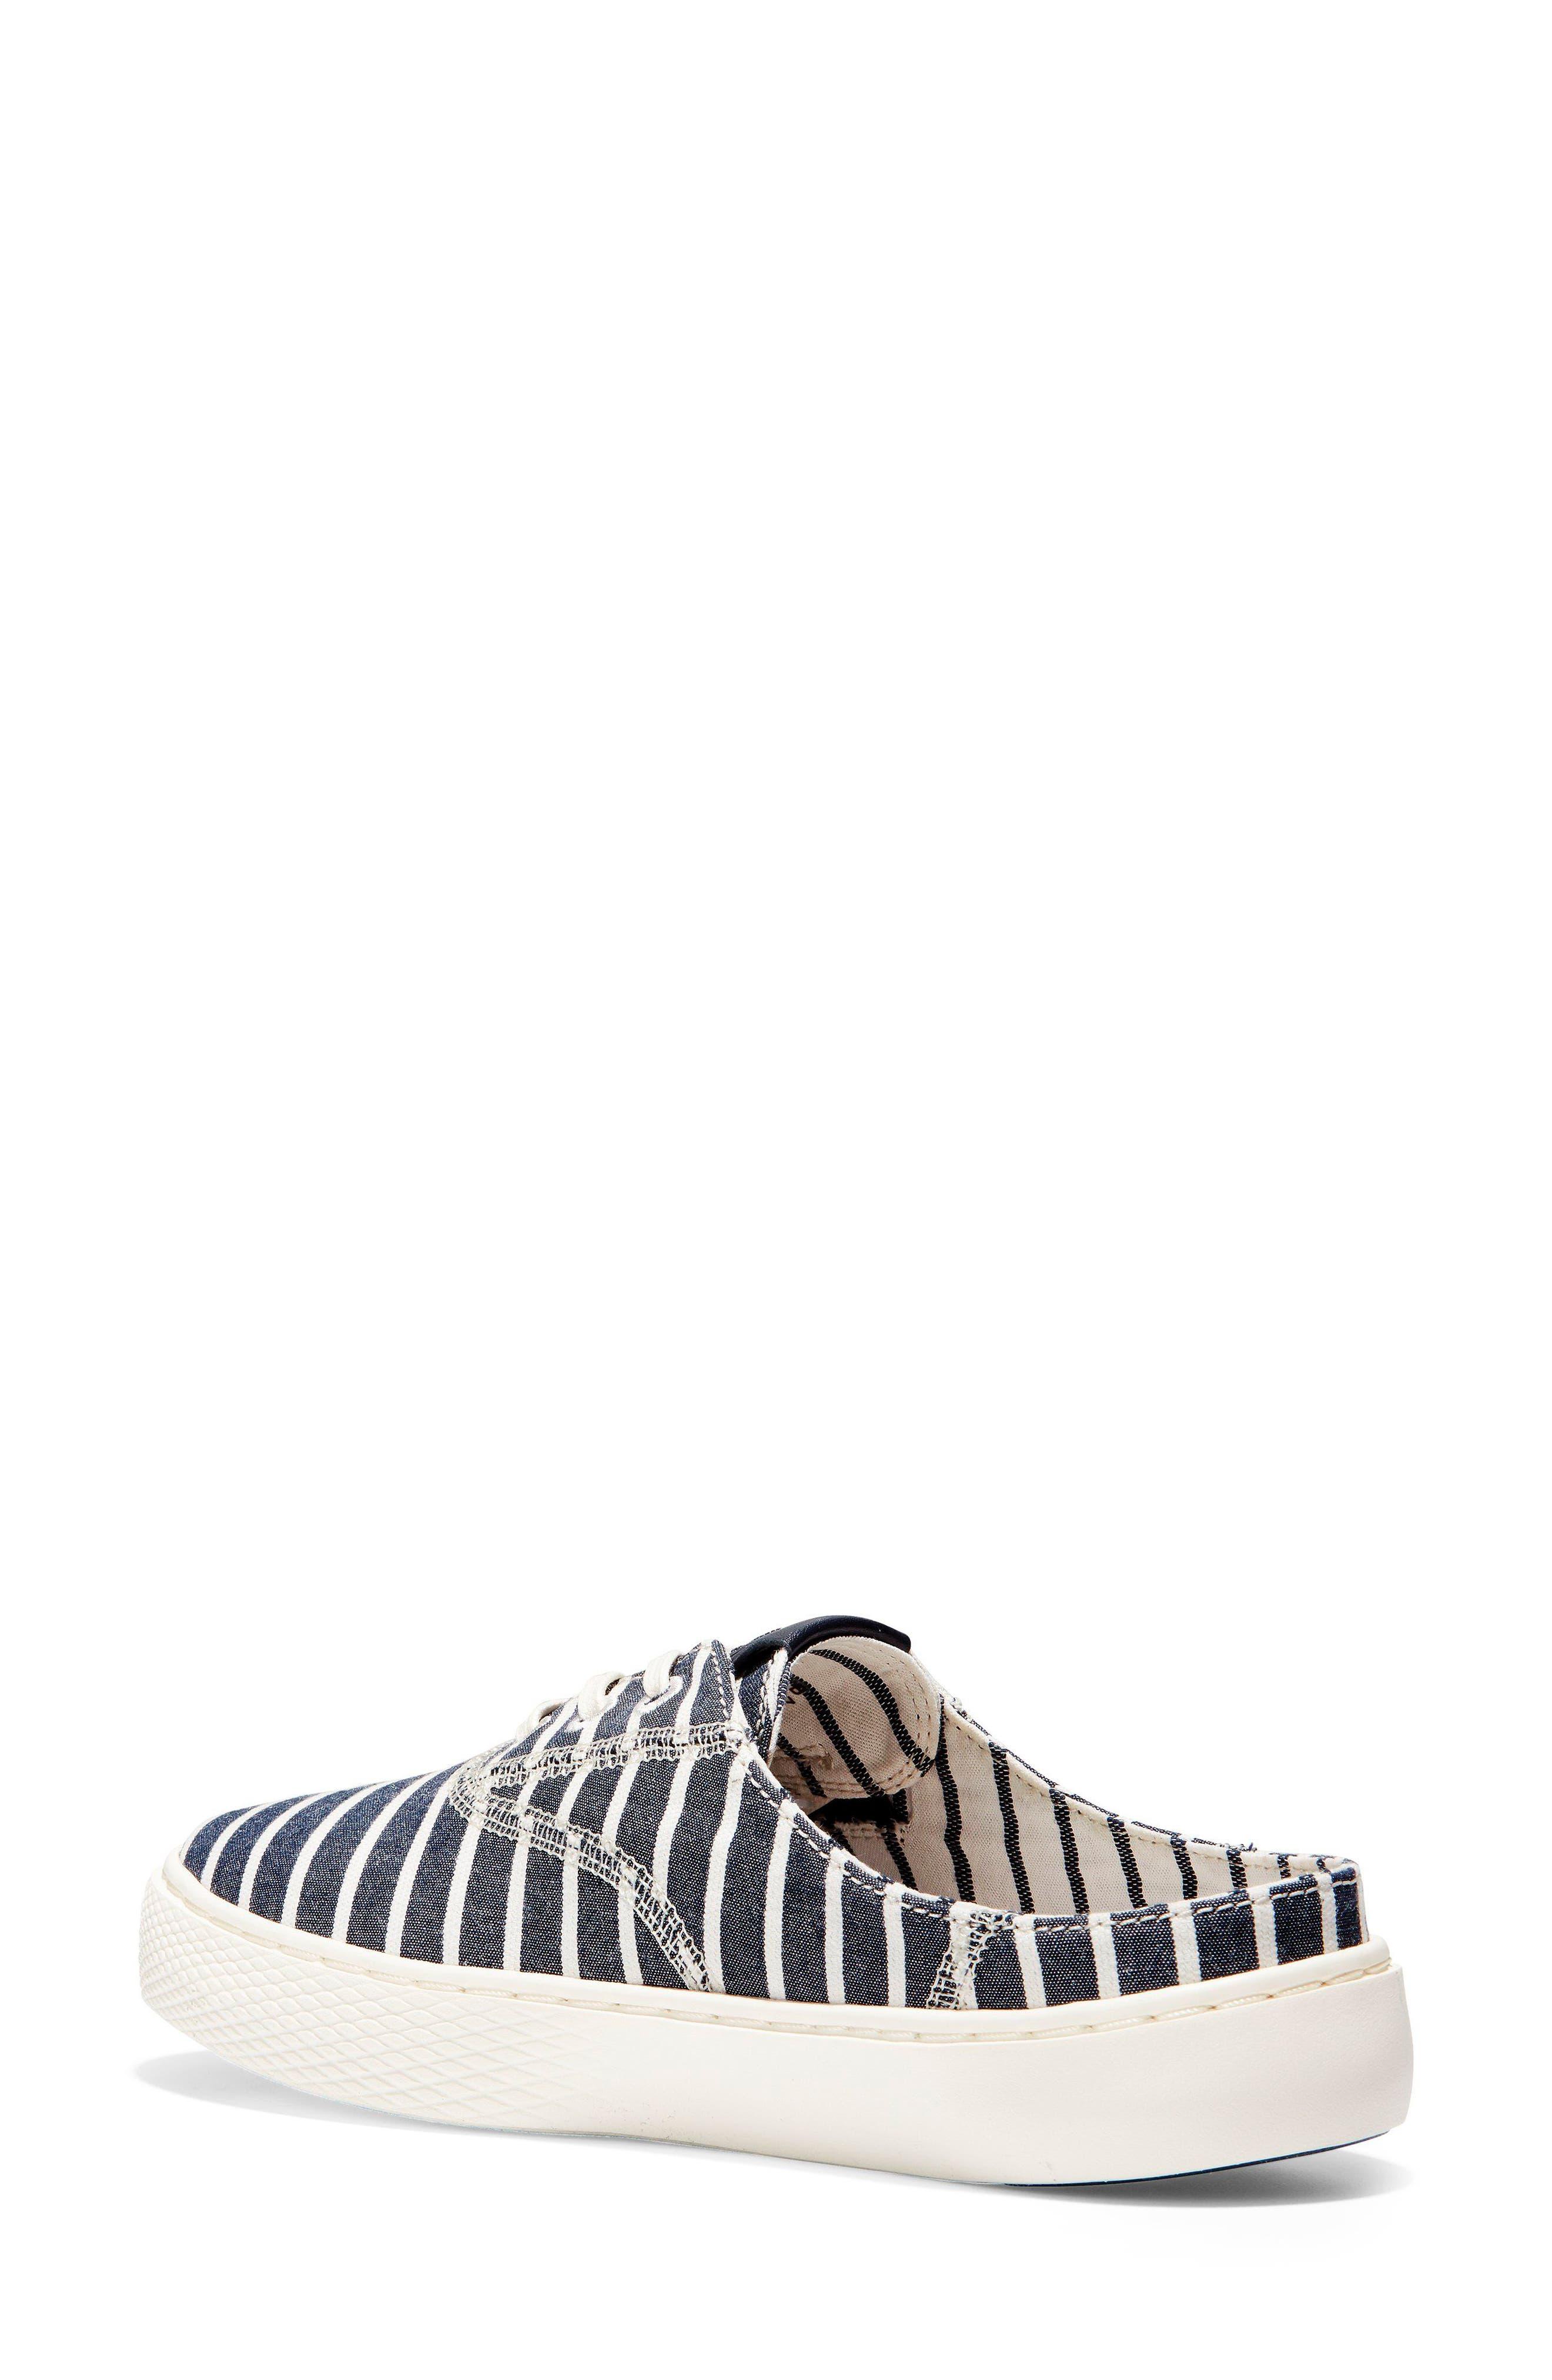 GrandPro Deck Sneaker,                             Alternate thumbnail 2, color,                             Freeport Stripe Fabric